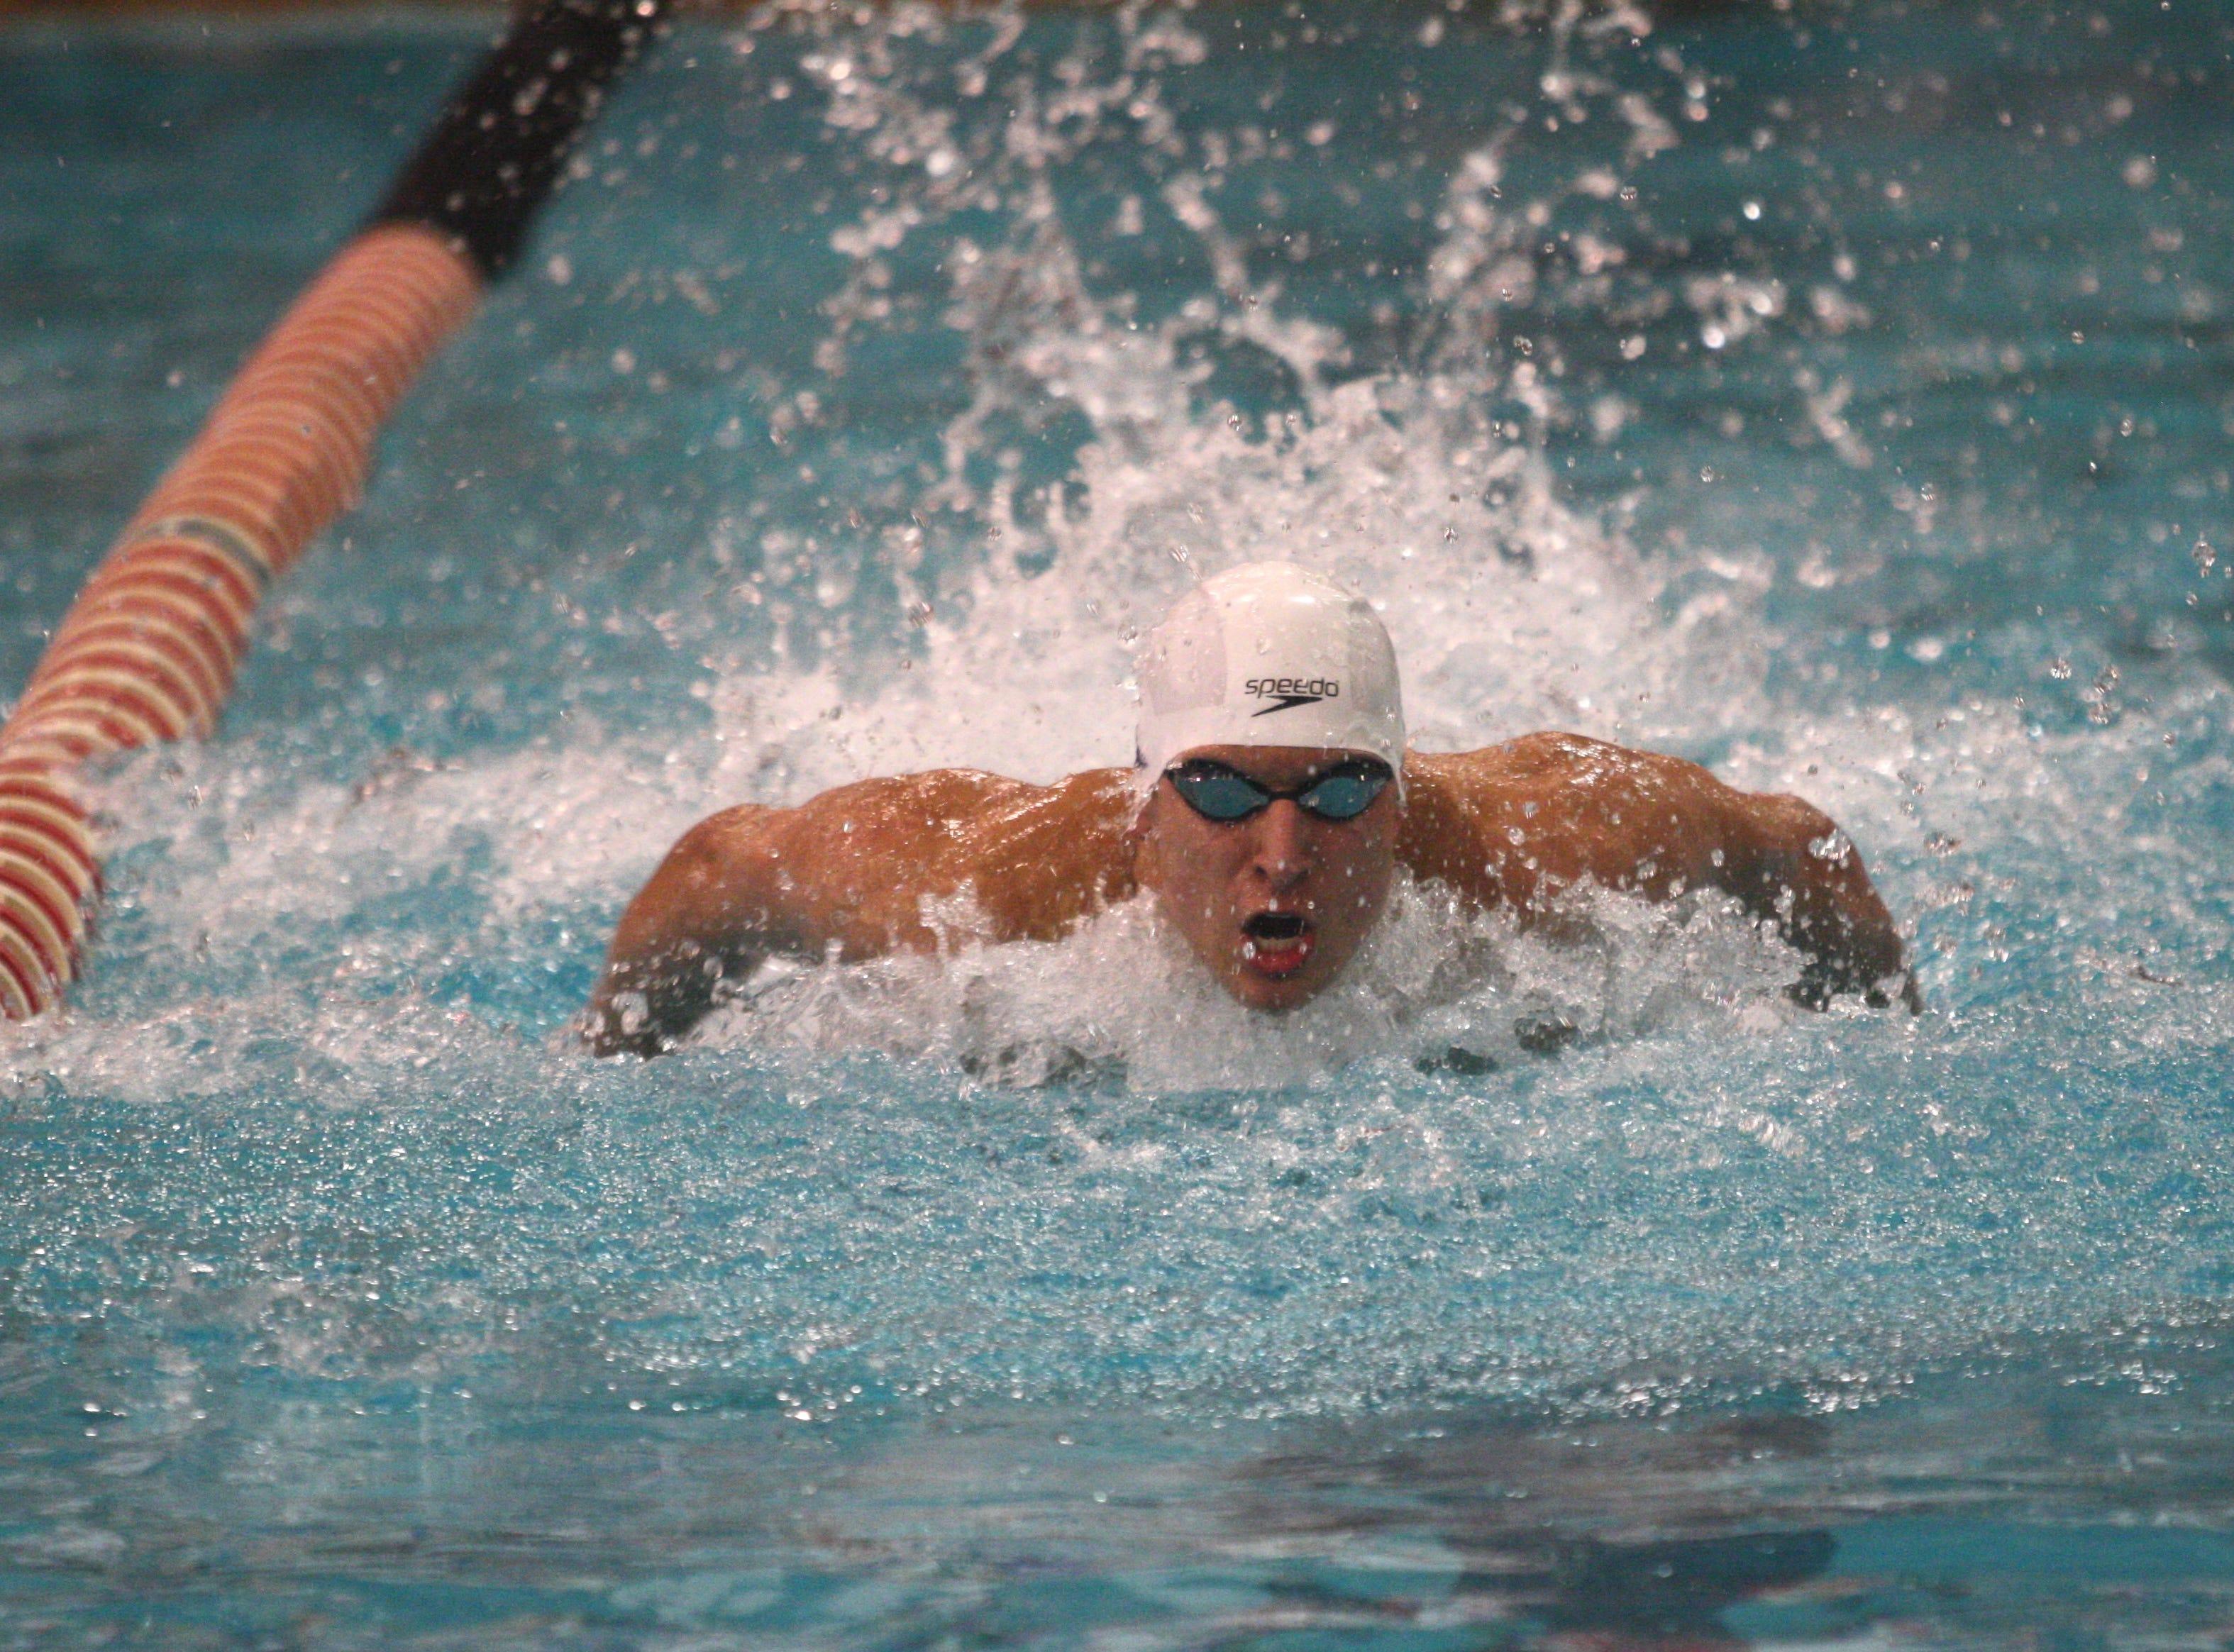 St. Xavier's Nicholas Perera competes in the 200 individual medley at the Division I state swim meet Saturday, Feb. 24, 2018, at C.T. Branin Natatorium.